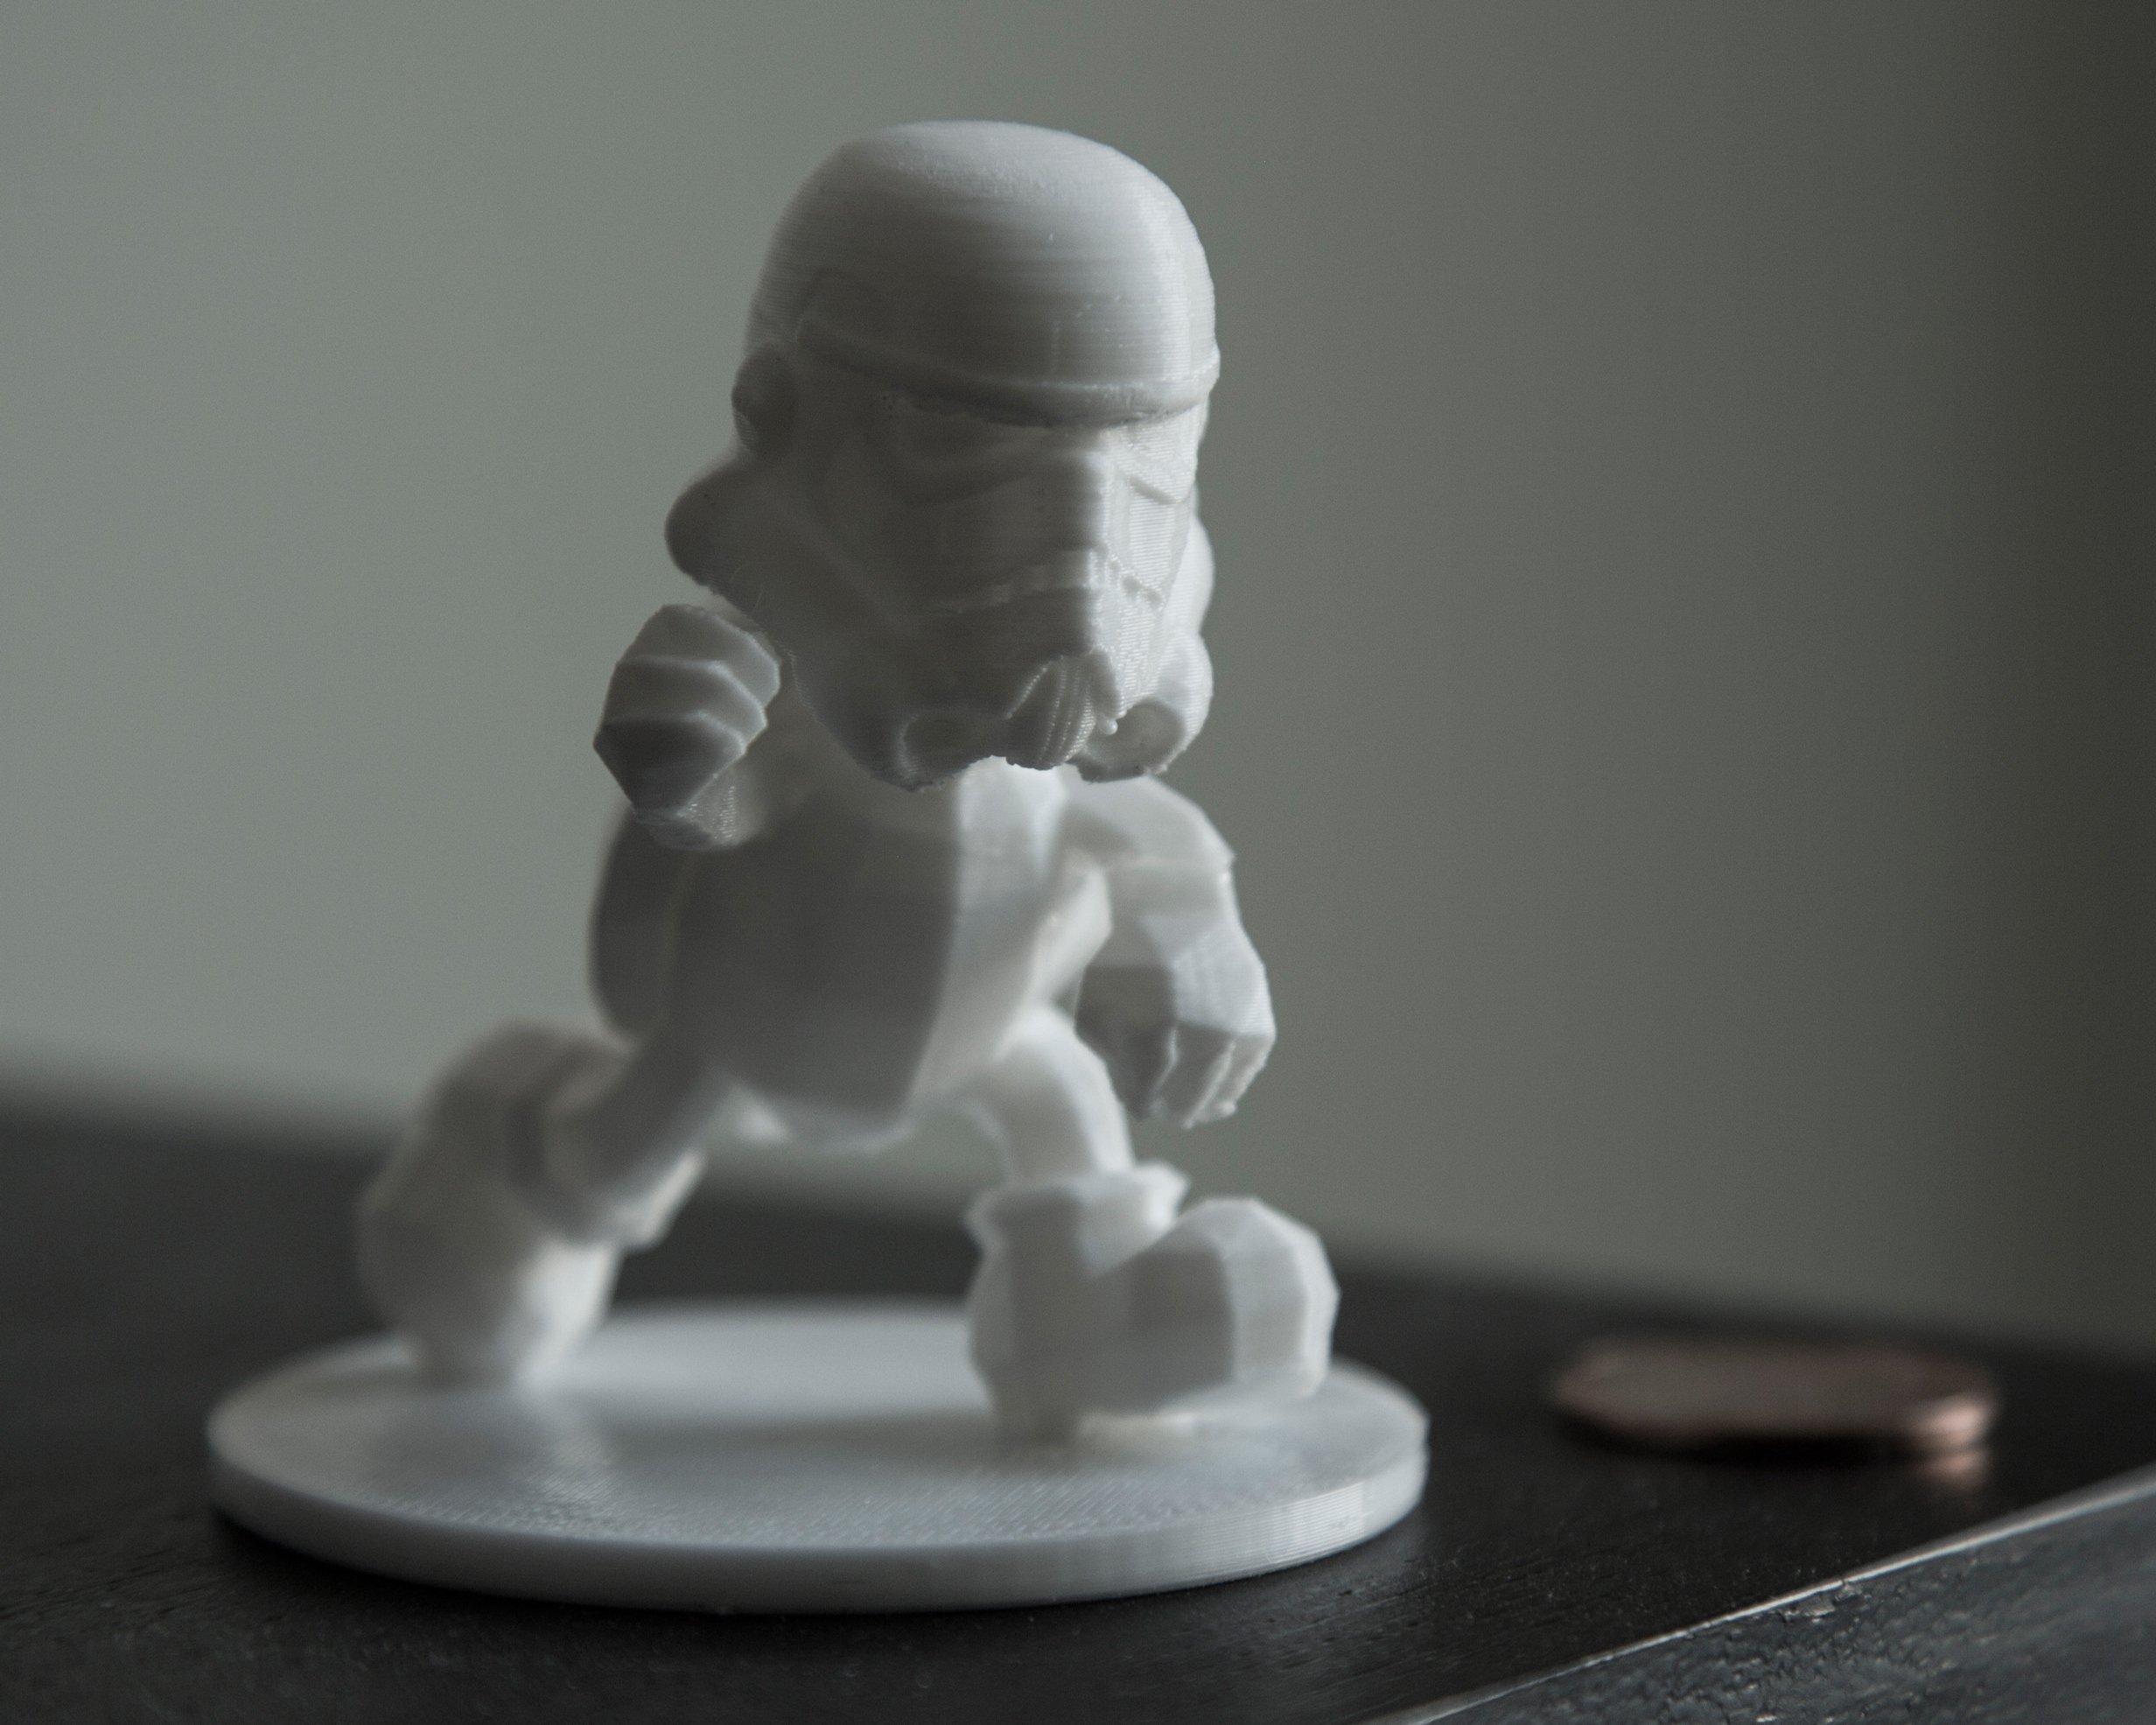 3d printed stormtroopa stormtrooper koopa troopa statue by rigelbot pinshape